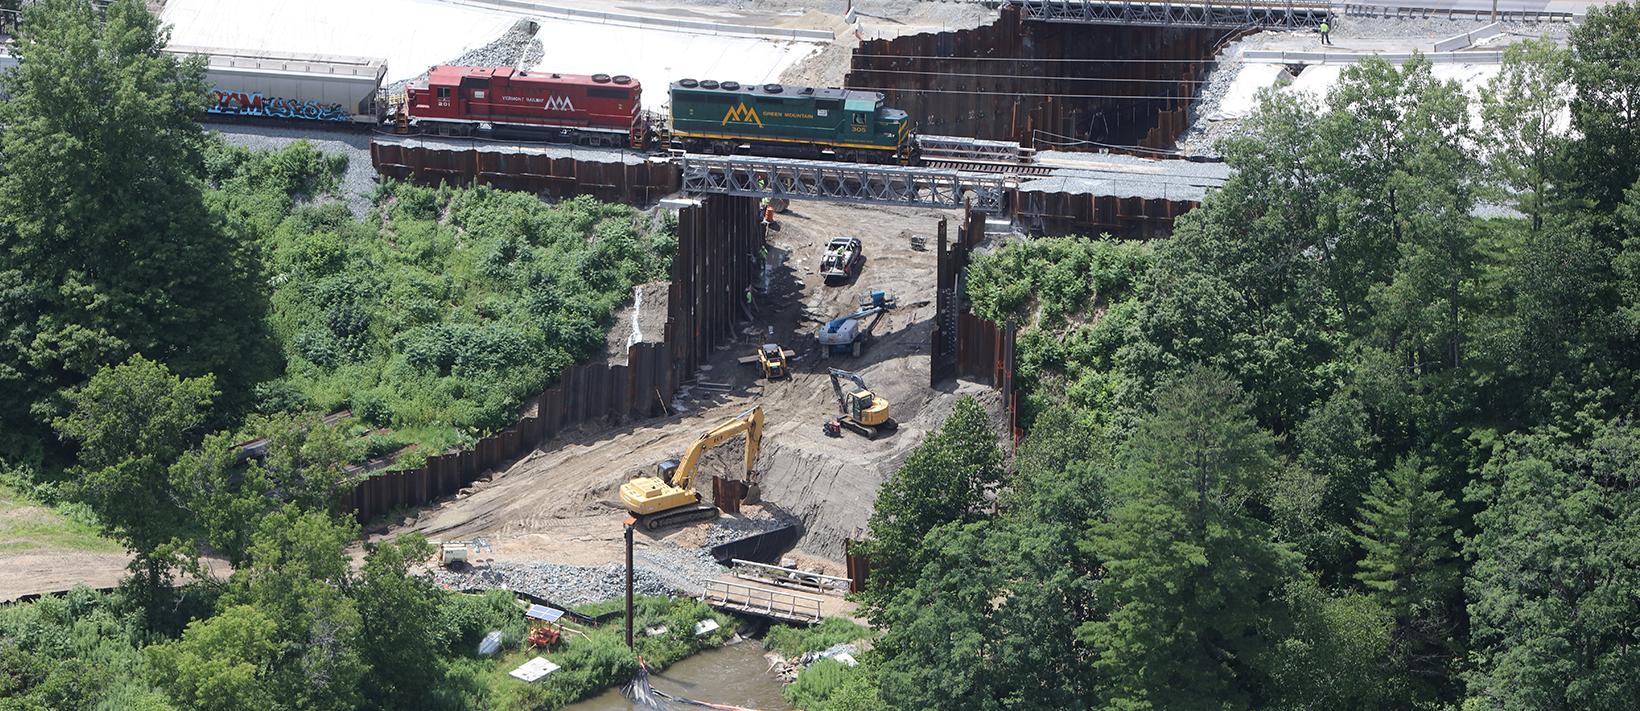 Railroad Modular Bridge